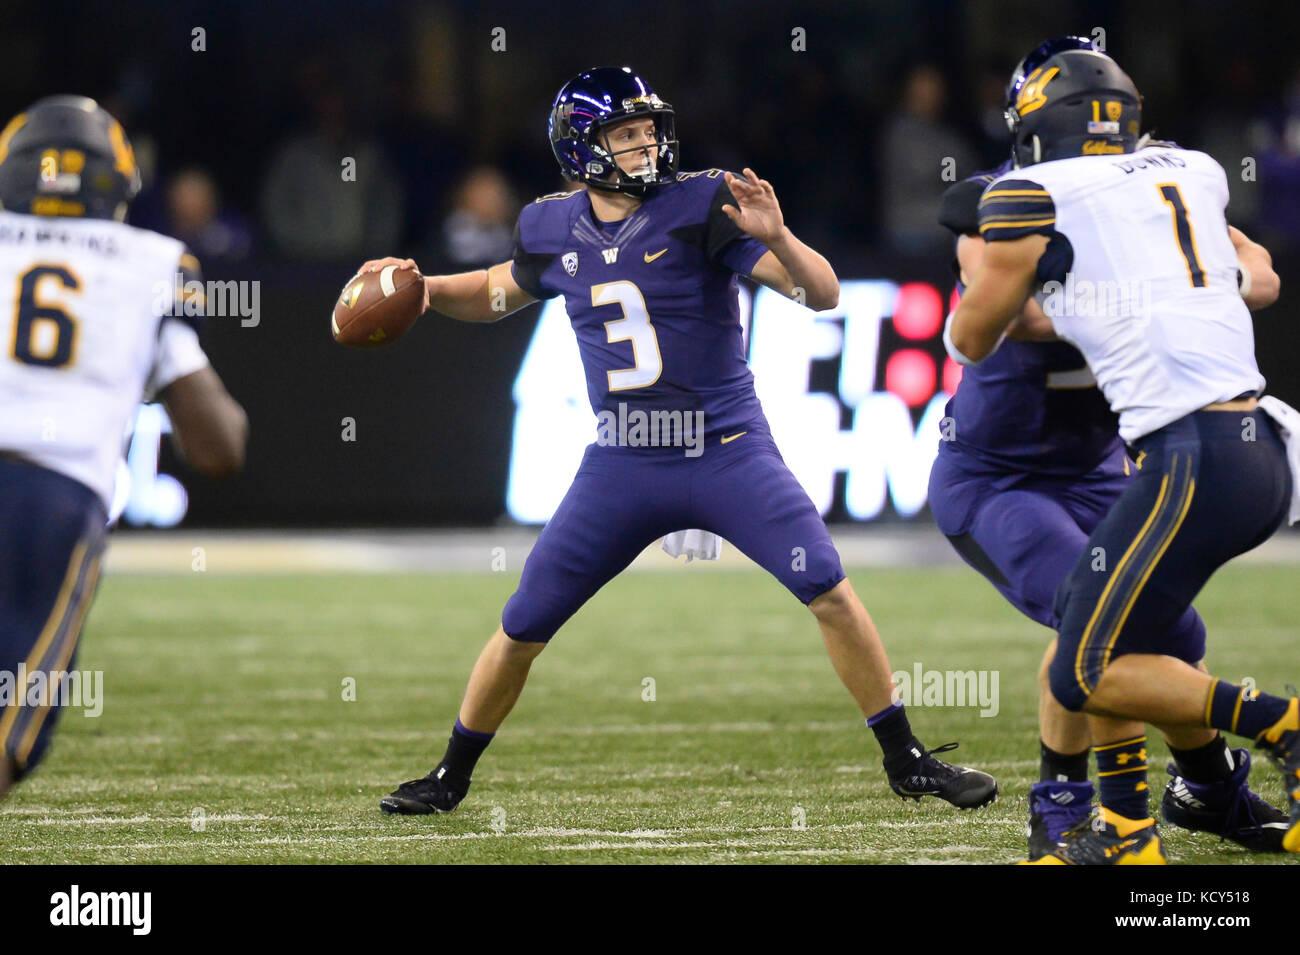 Seattle, WA, USA. 7th Oct, 2017. UW quarterback Jake Browning in ...